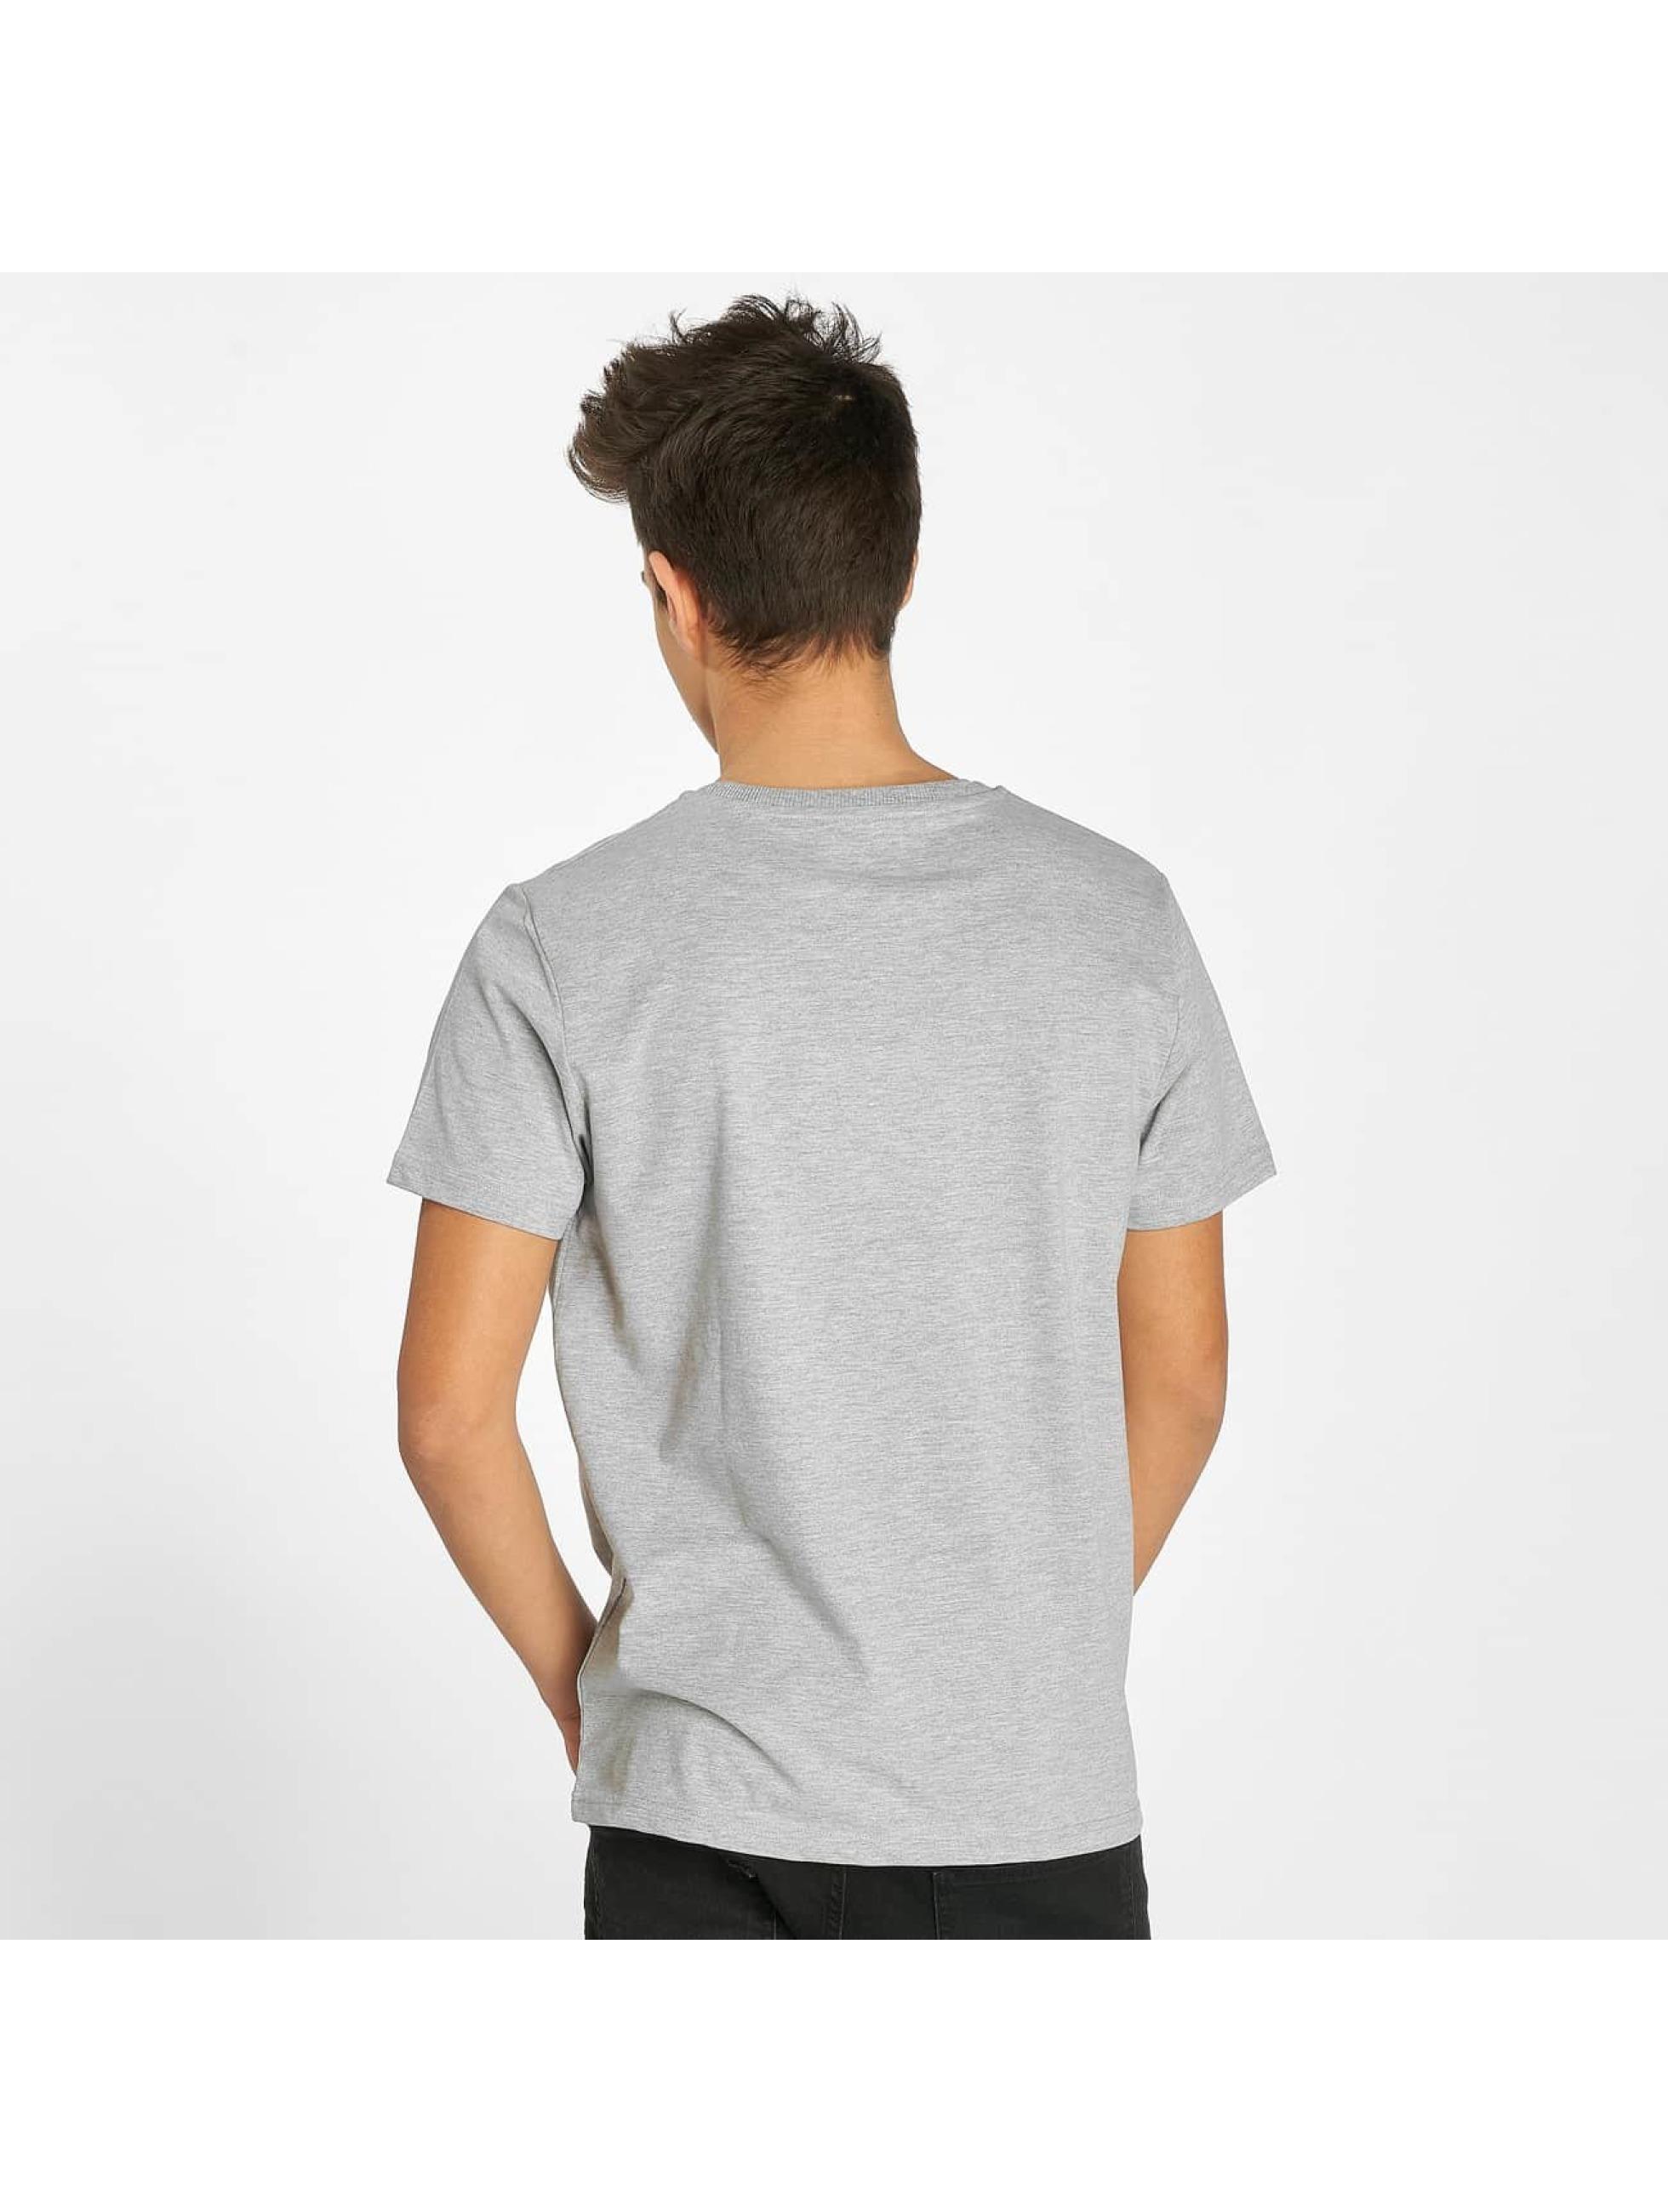 Kulte Camiseta Corpo gris